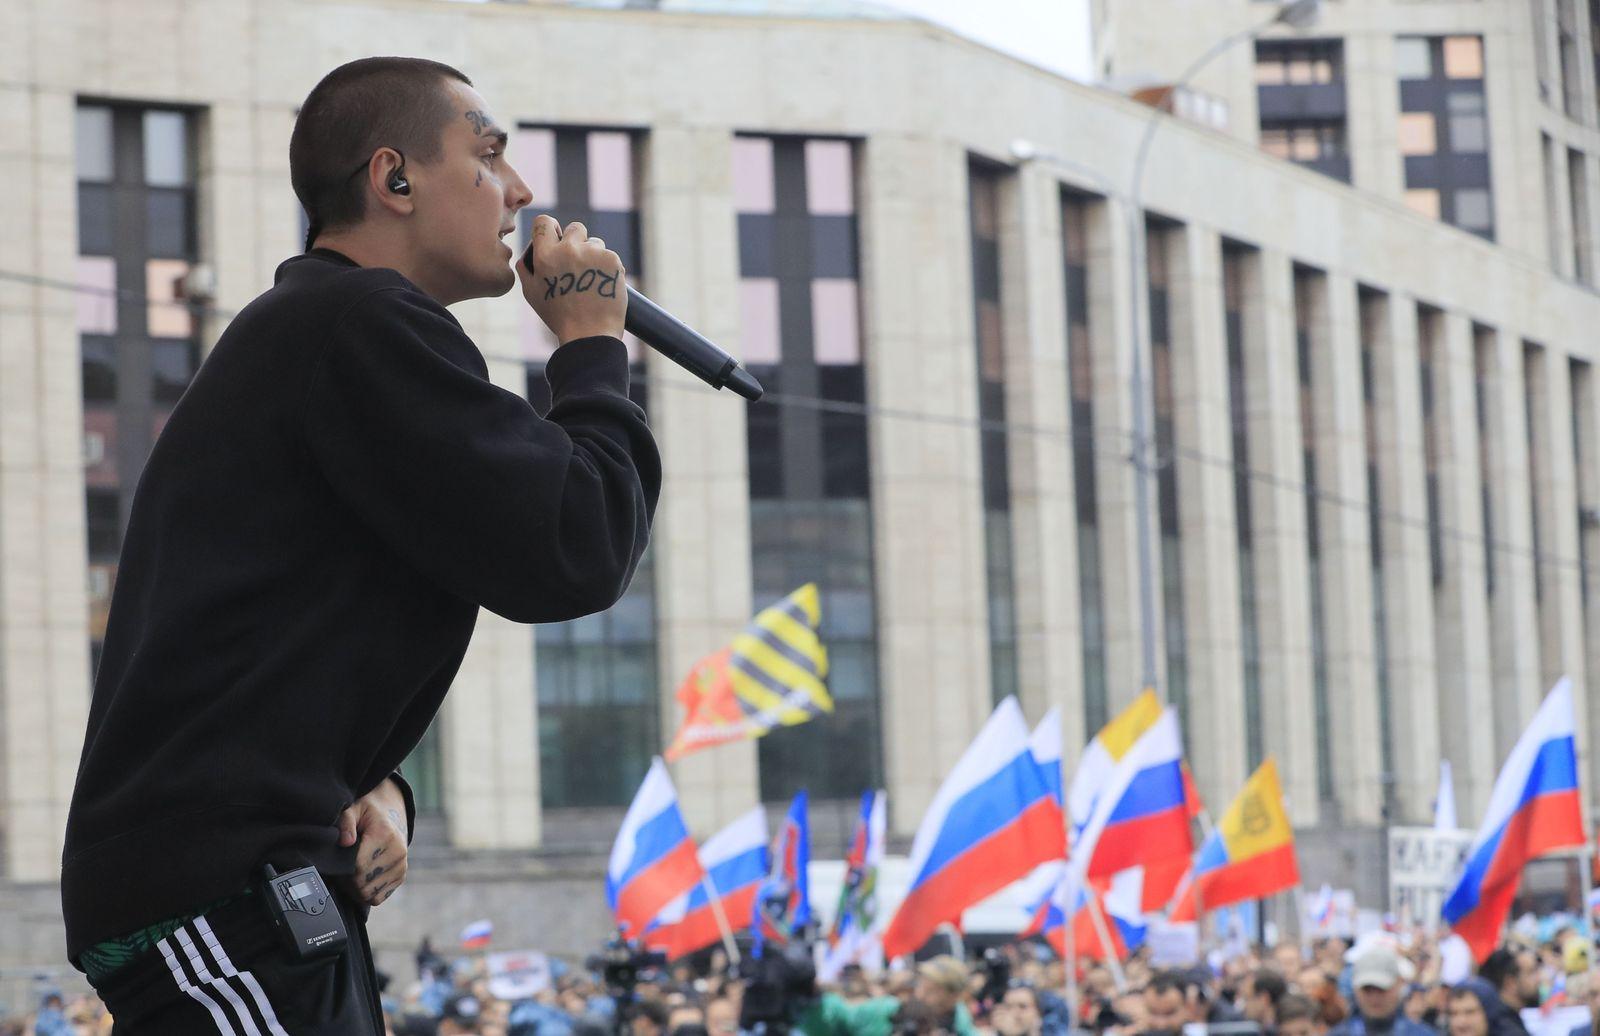 RUSSIA-POLITICS/PROTESTS